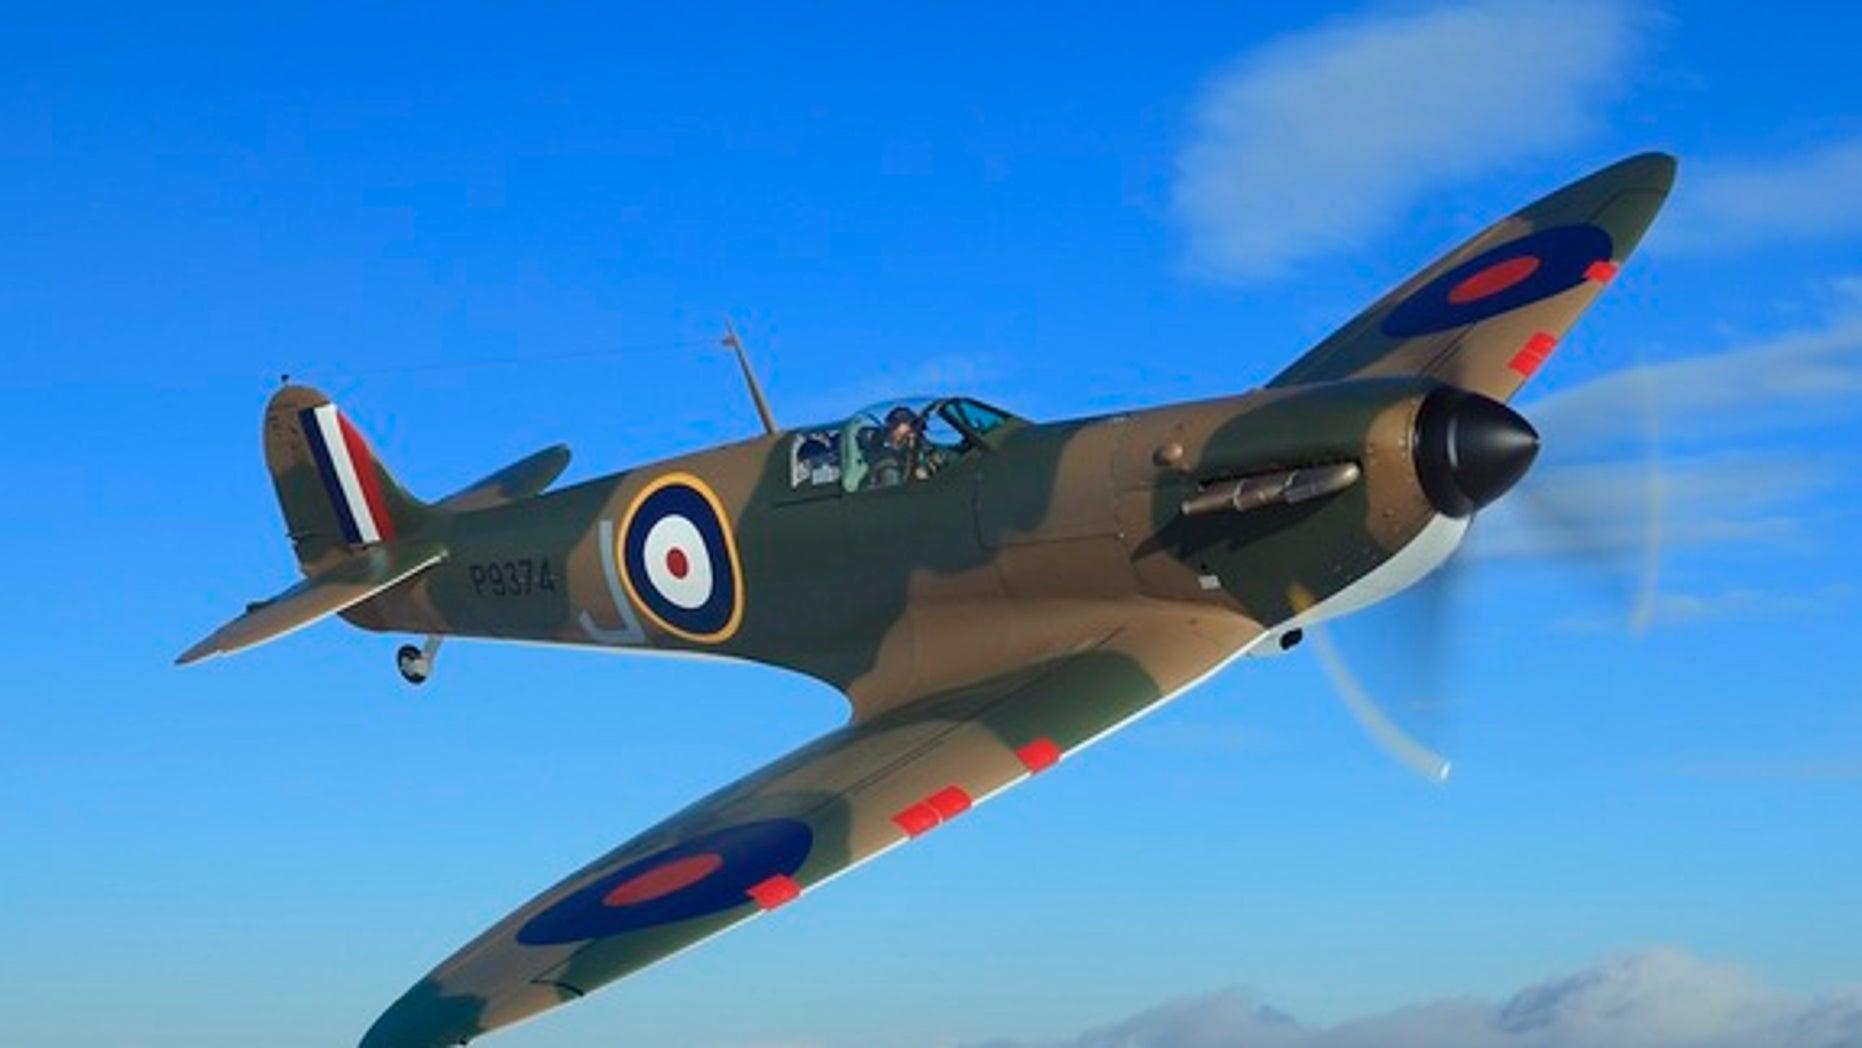 This restored Mk.1 Spitfire warplane was flown by a Royal Air Force (RAF) pilot during World War II.